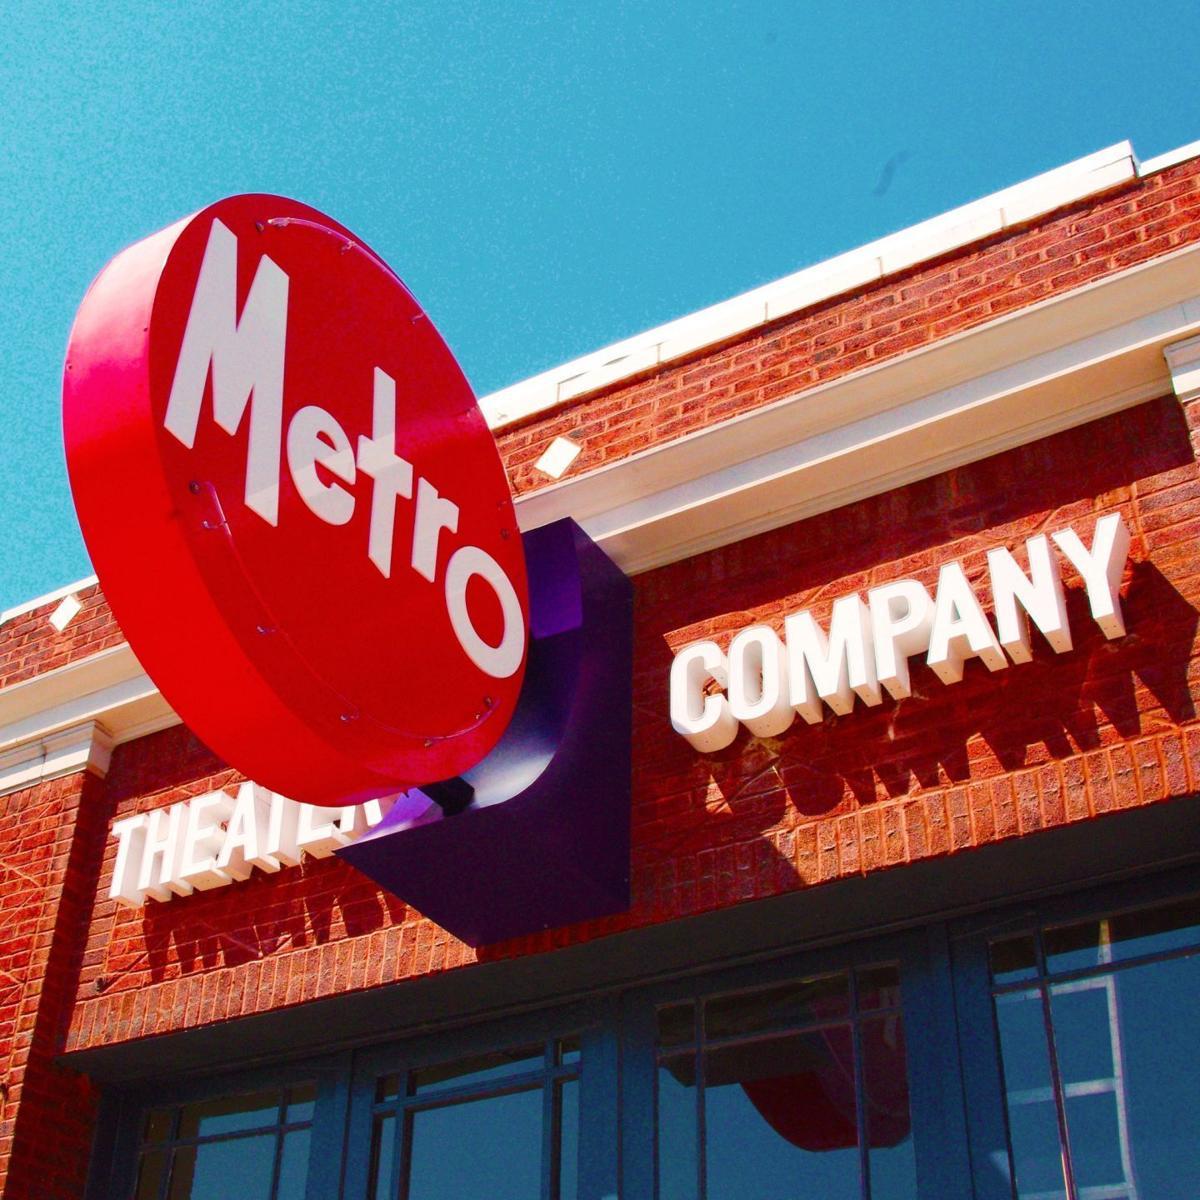 MetroTheaterCompany_sign.jpg